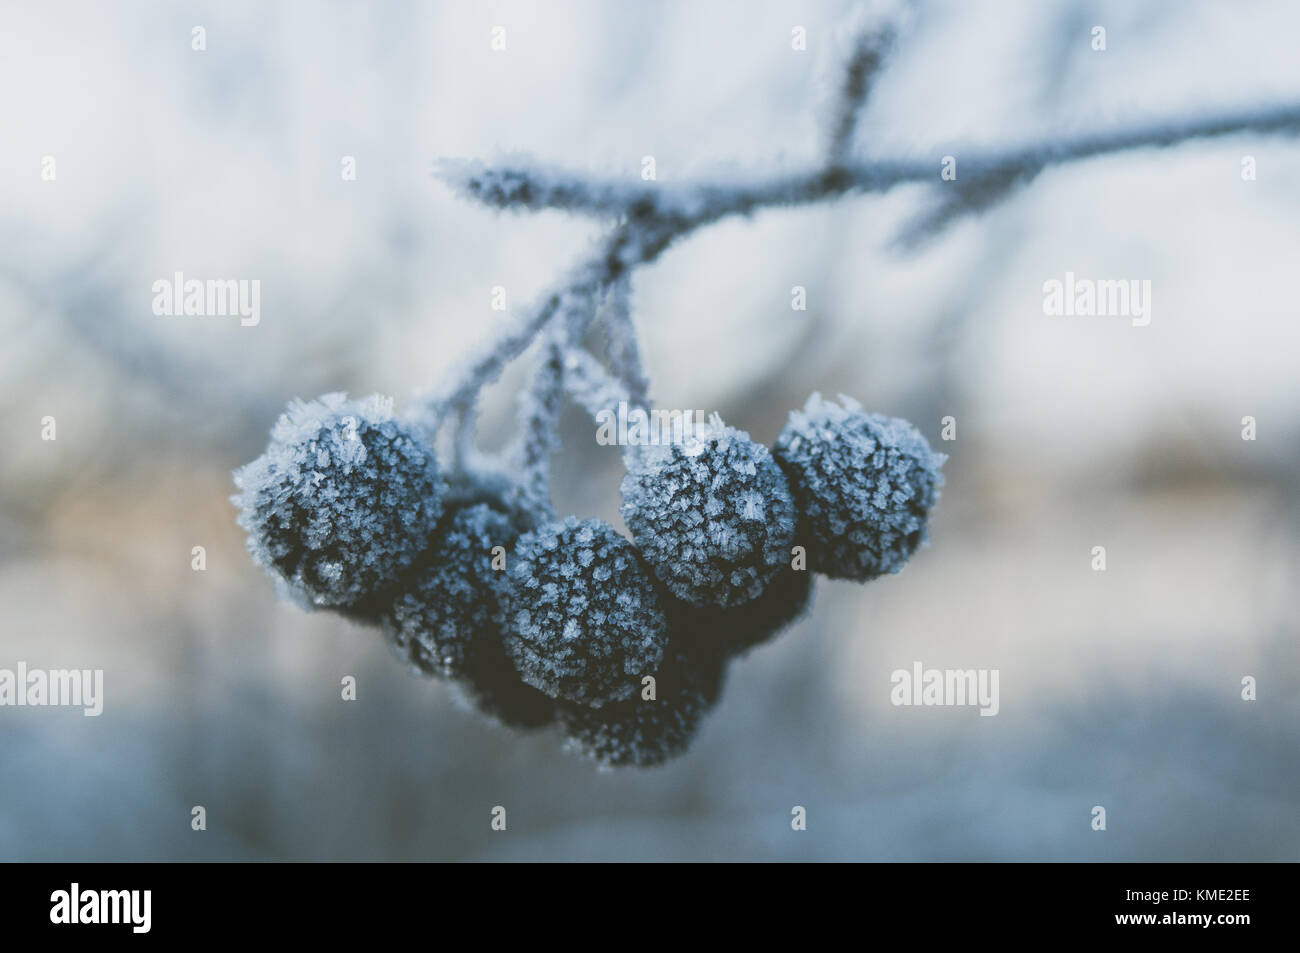 Aronia berries. Winter hoarfrost. - Stock Image